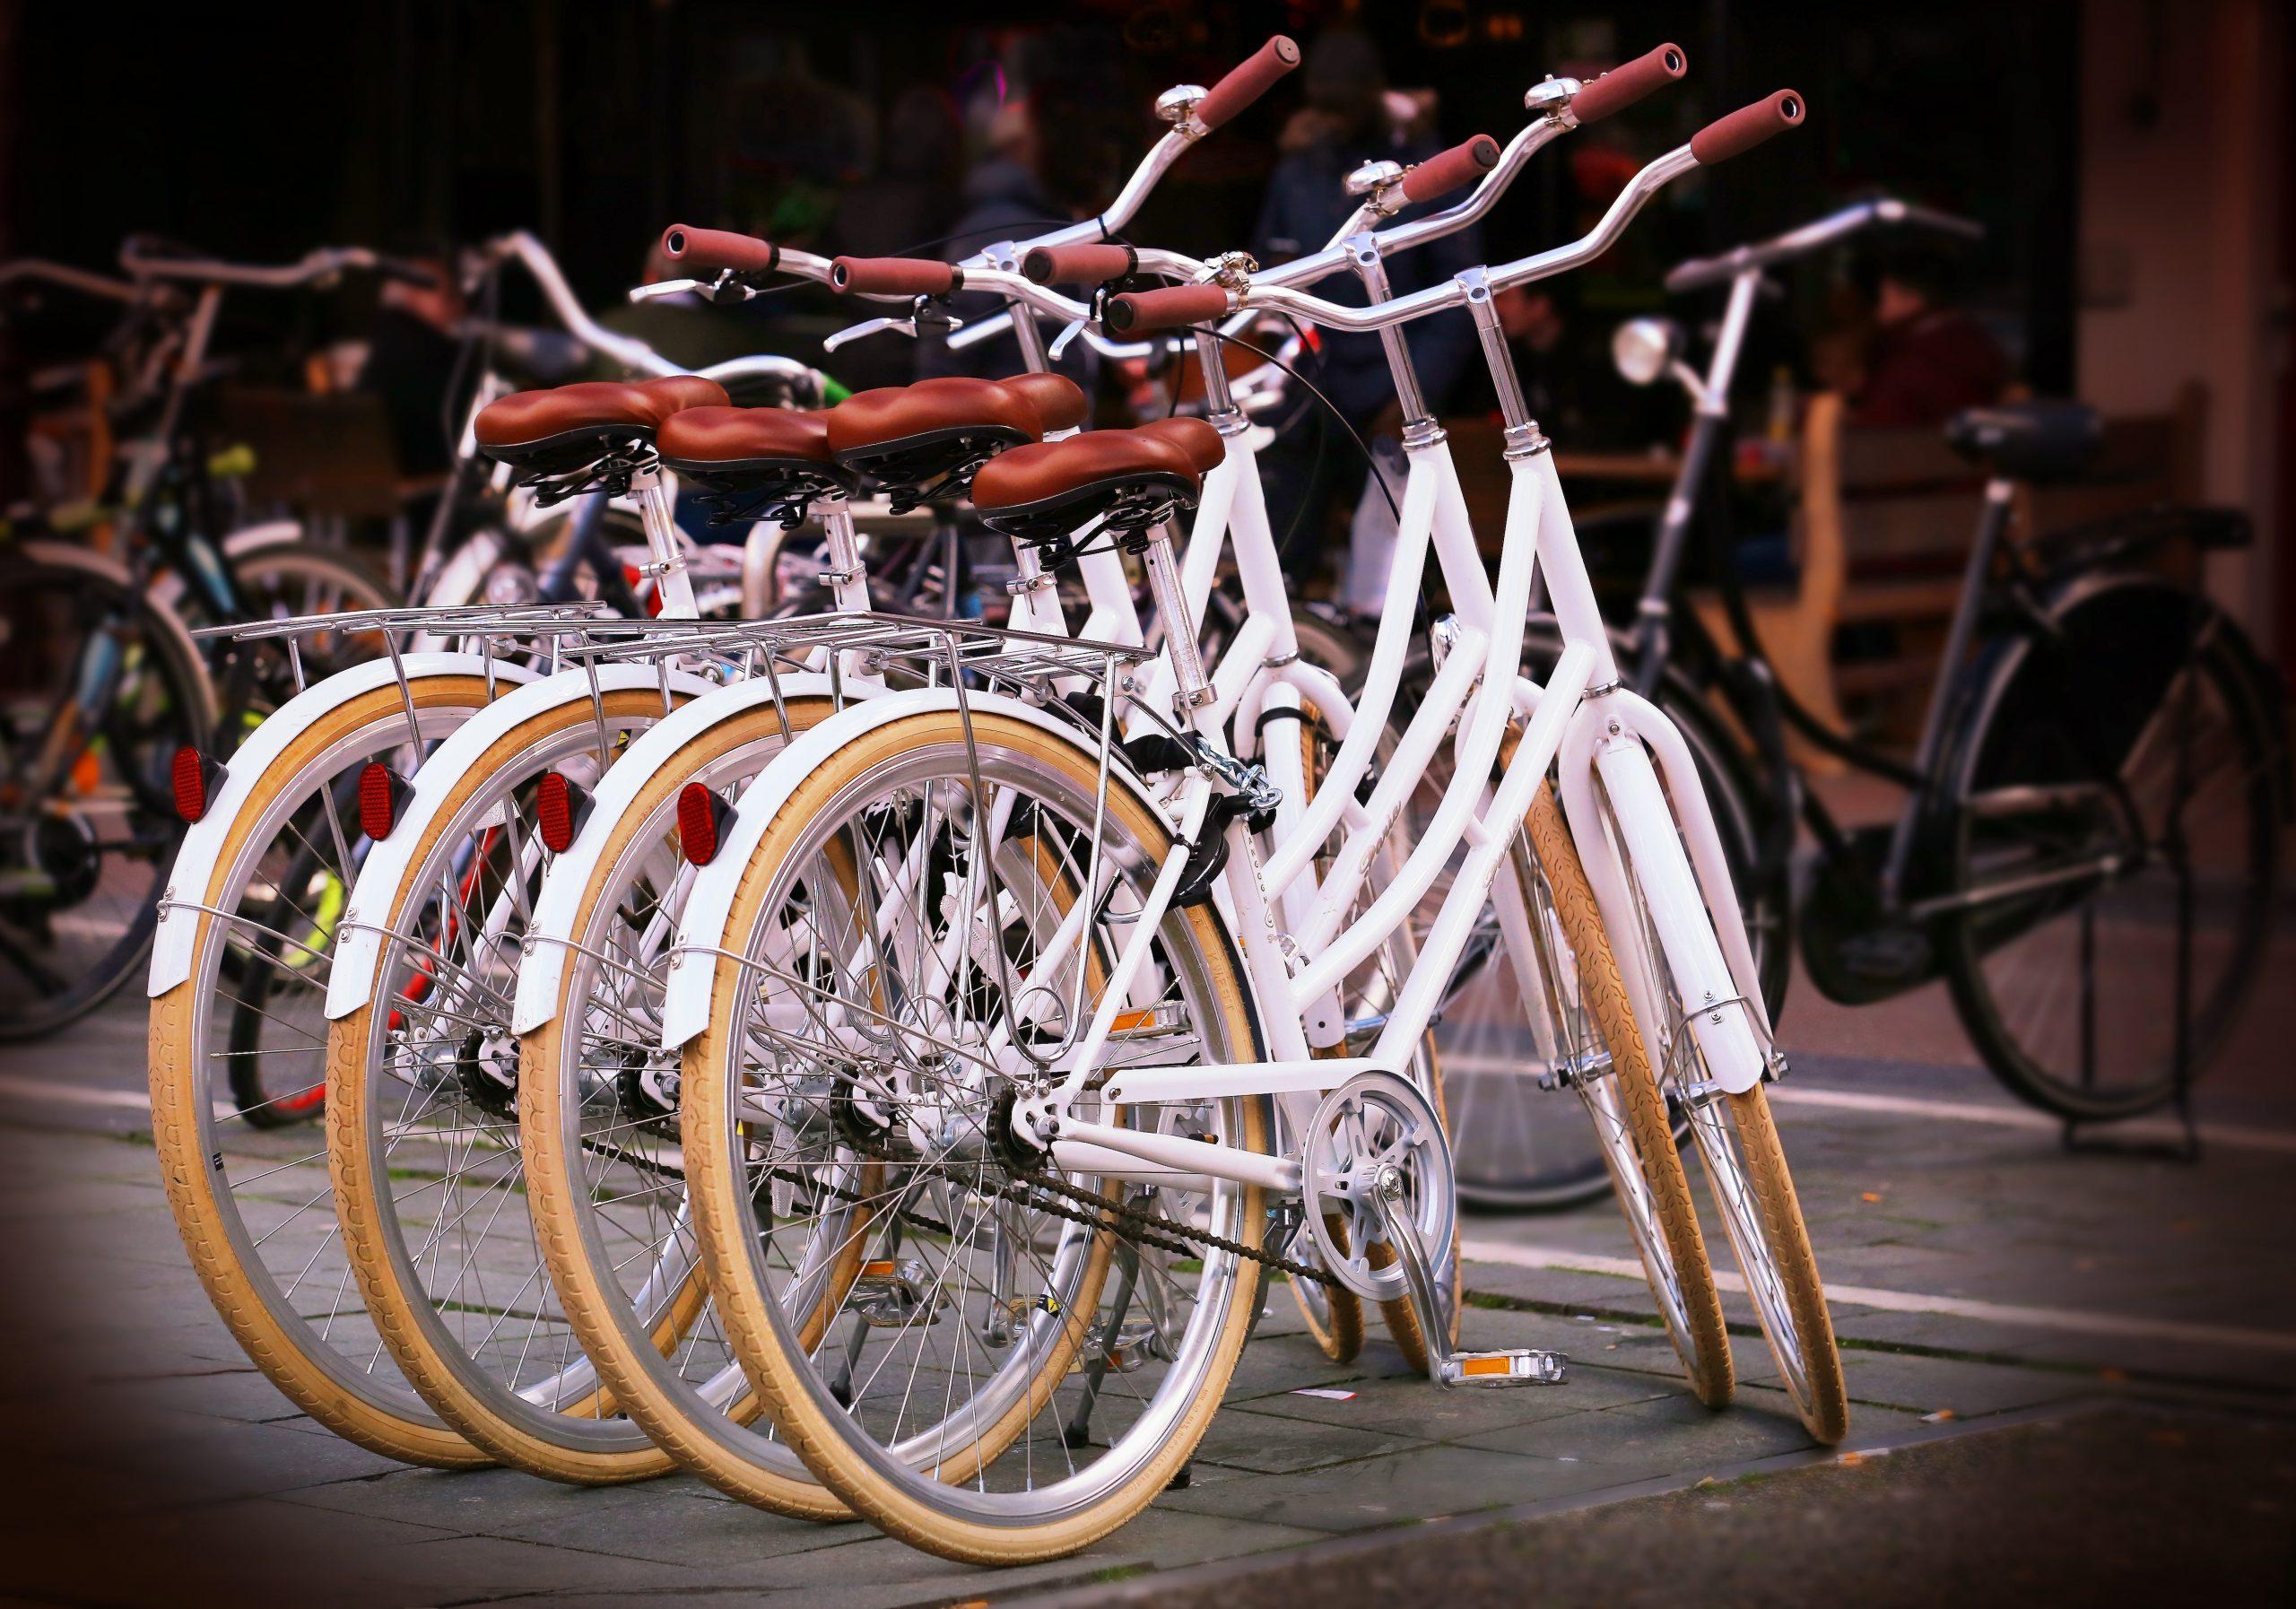 bicycle_parking_bicycles_bikes_36743